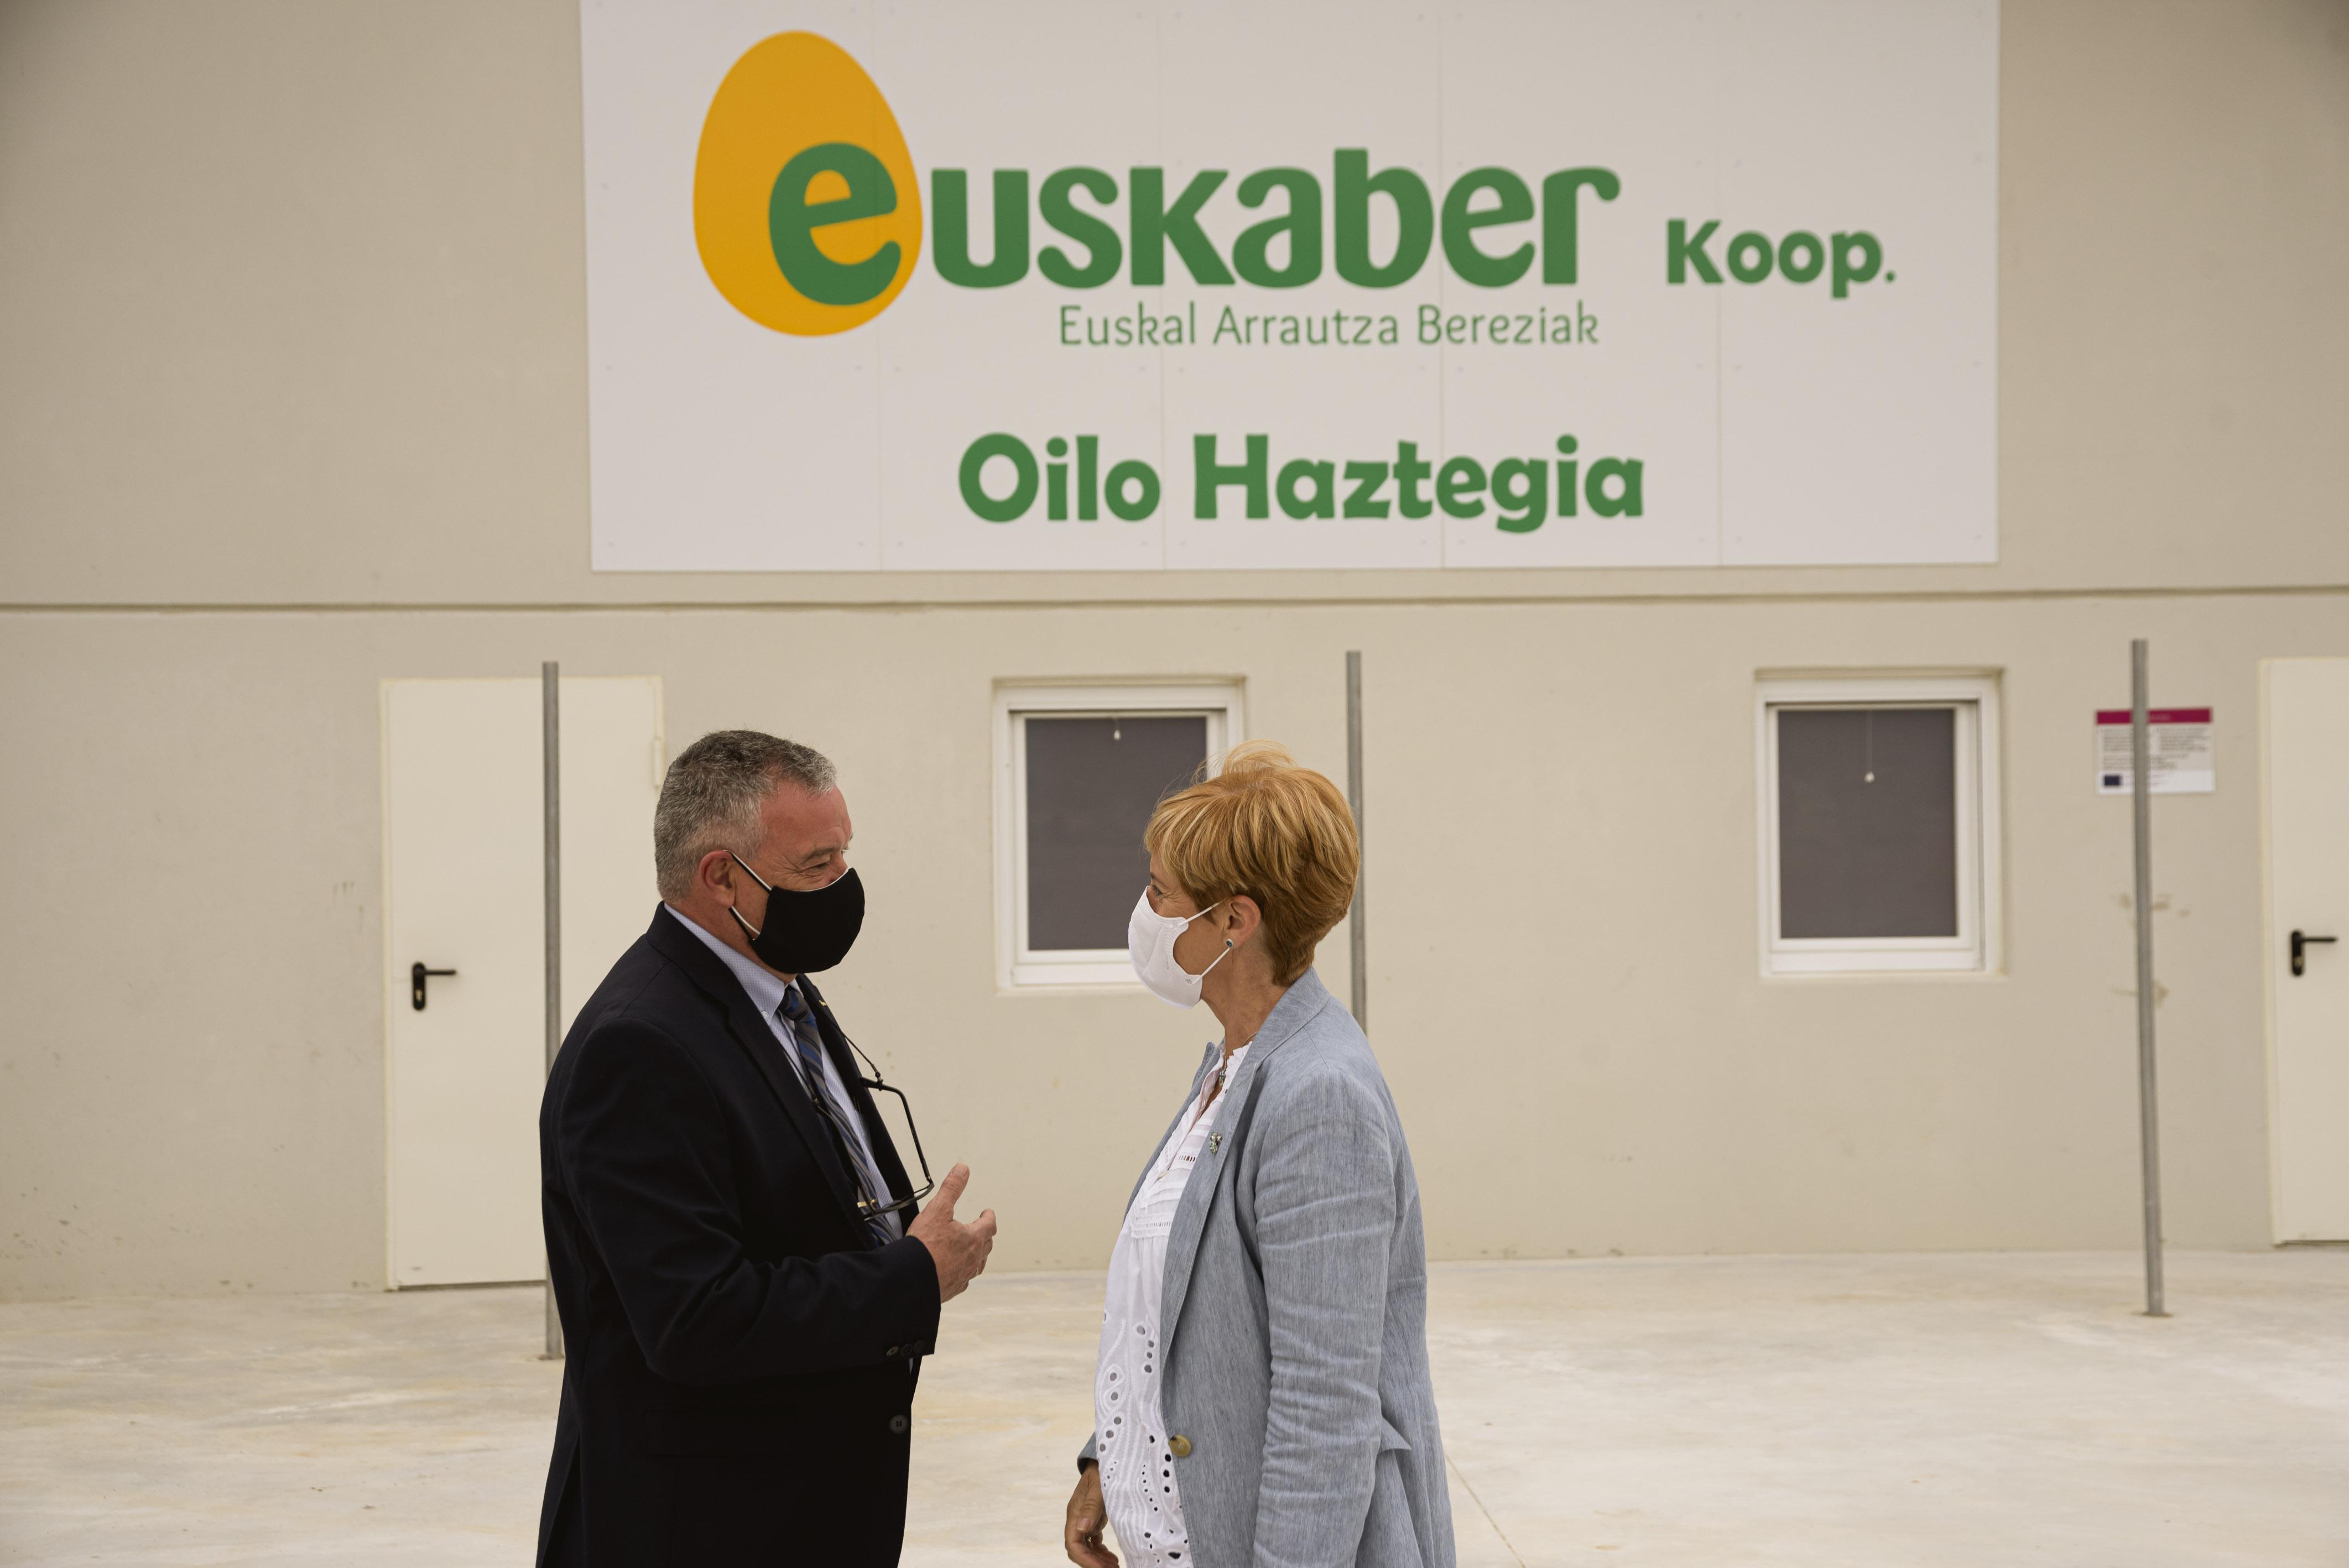 Euskaber_Hueto16-7-2021_usual-2974.jpg